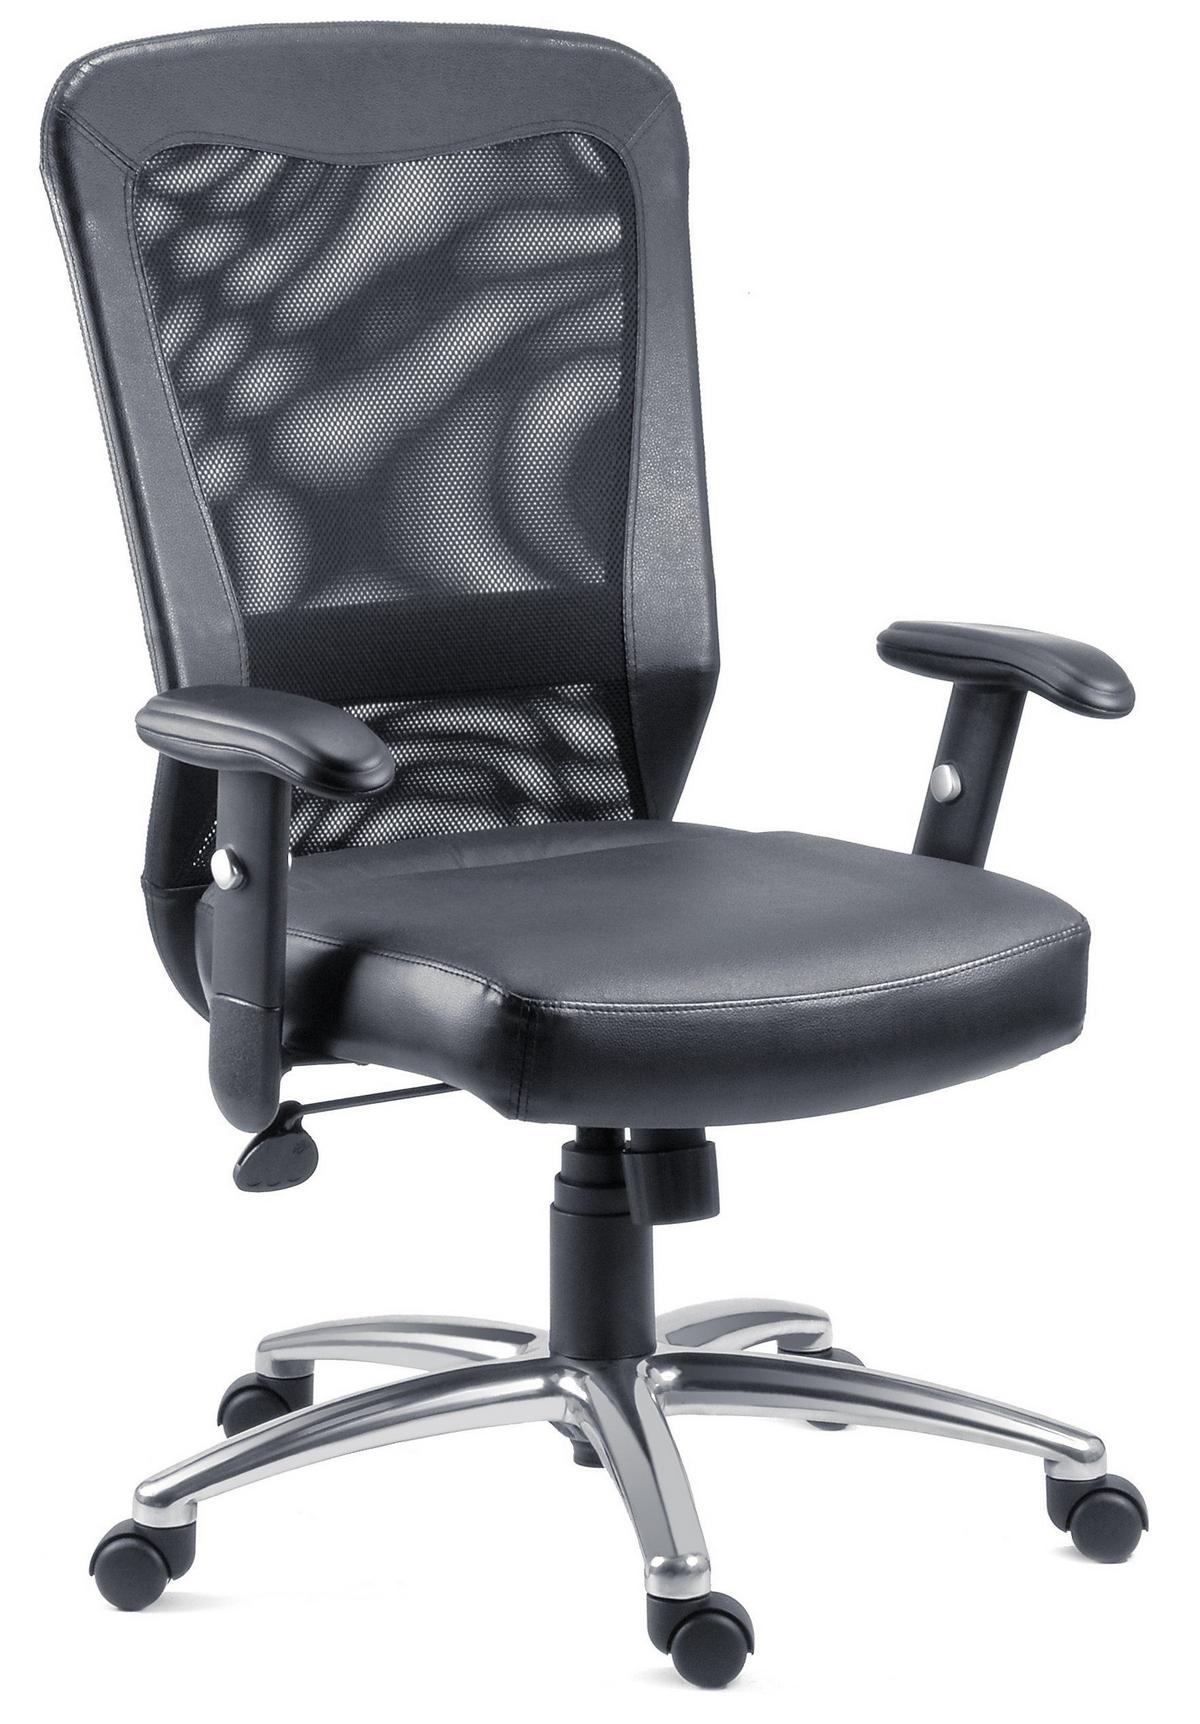 Ergonomic fice Chairs